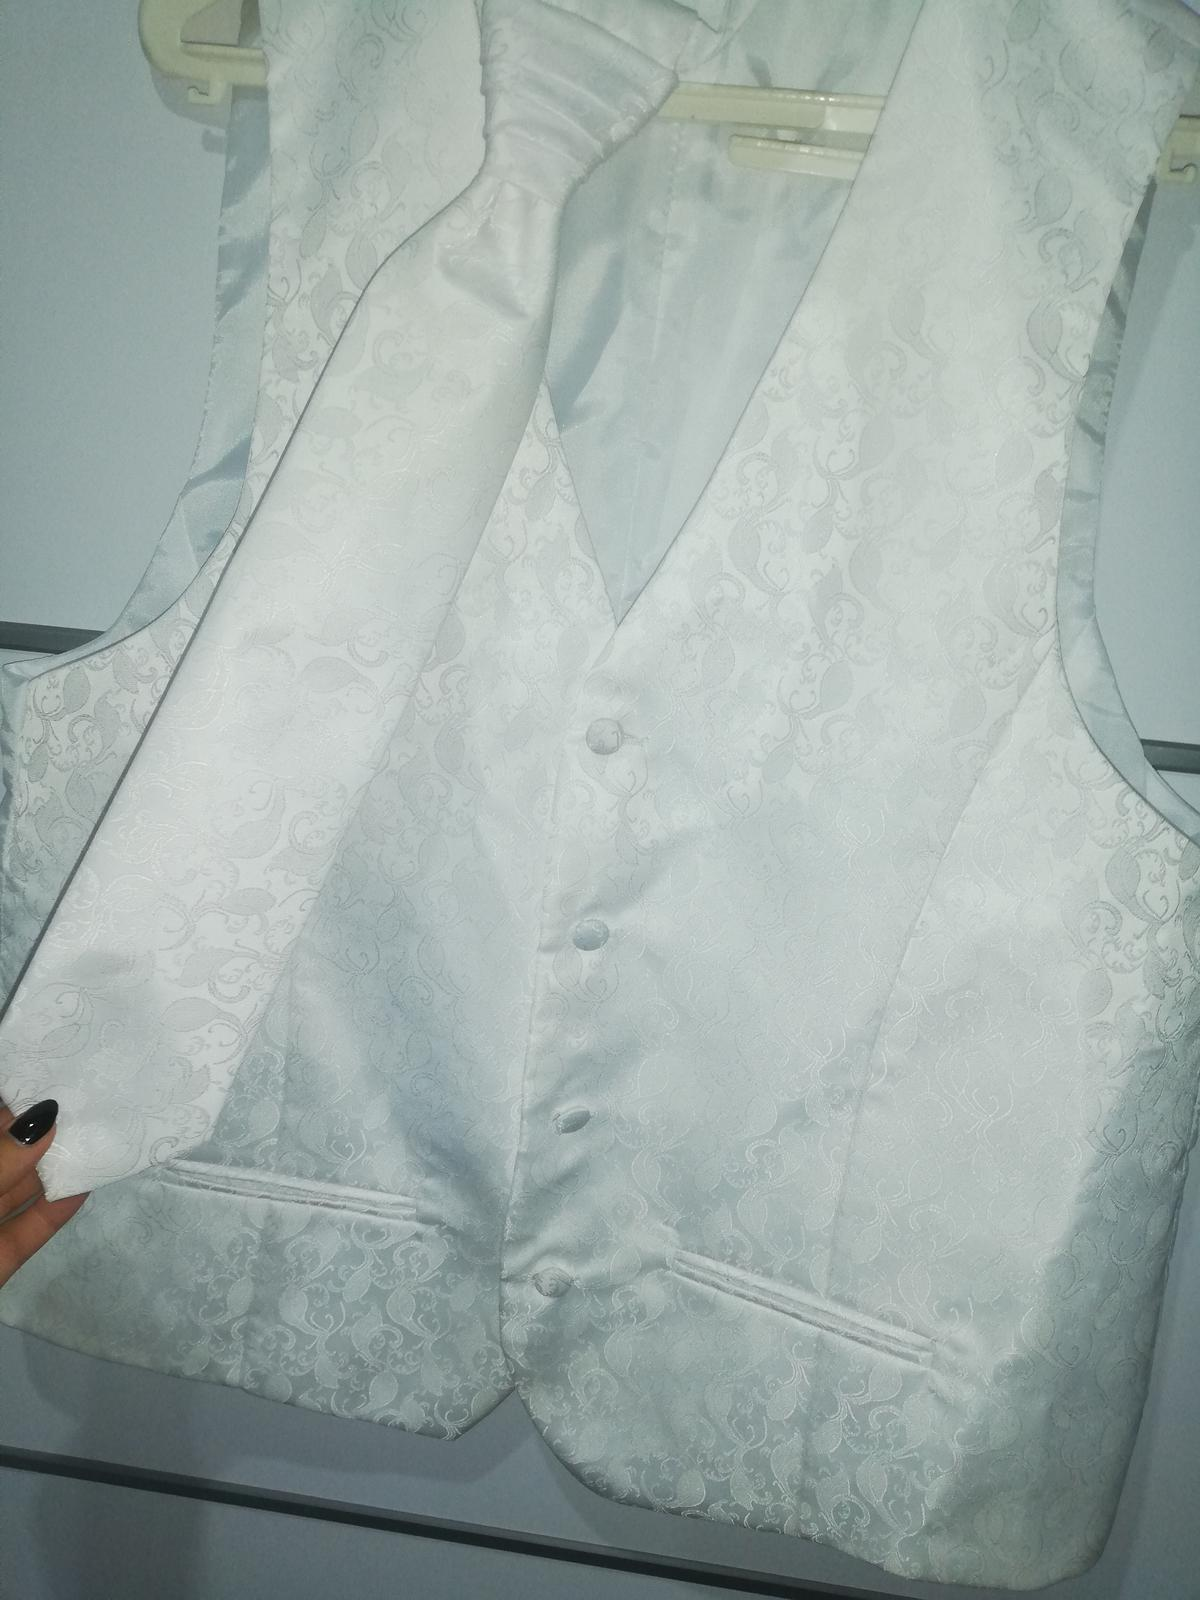 Svadobná vesta s kravatou pre ženícha - Obrázok č. 2